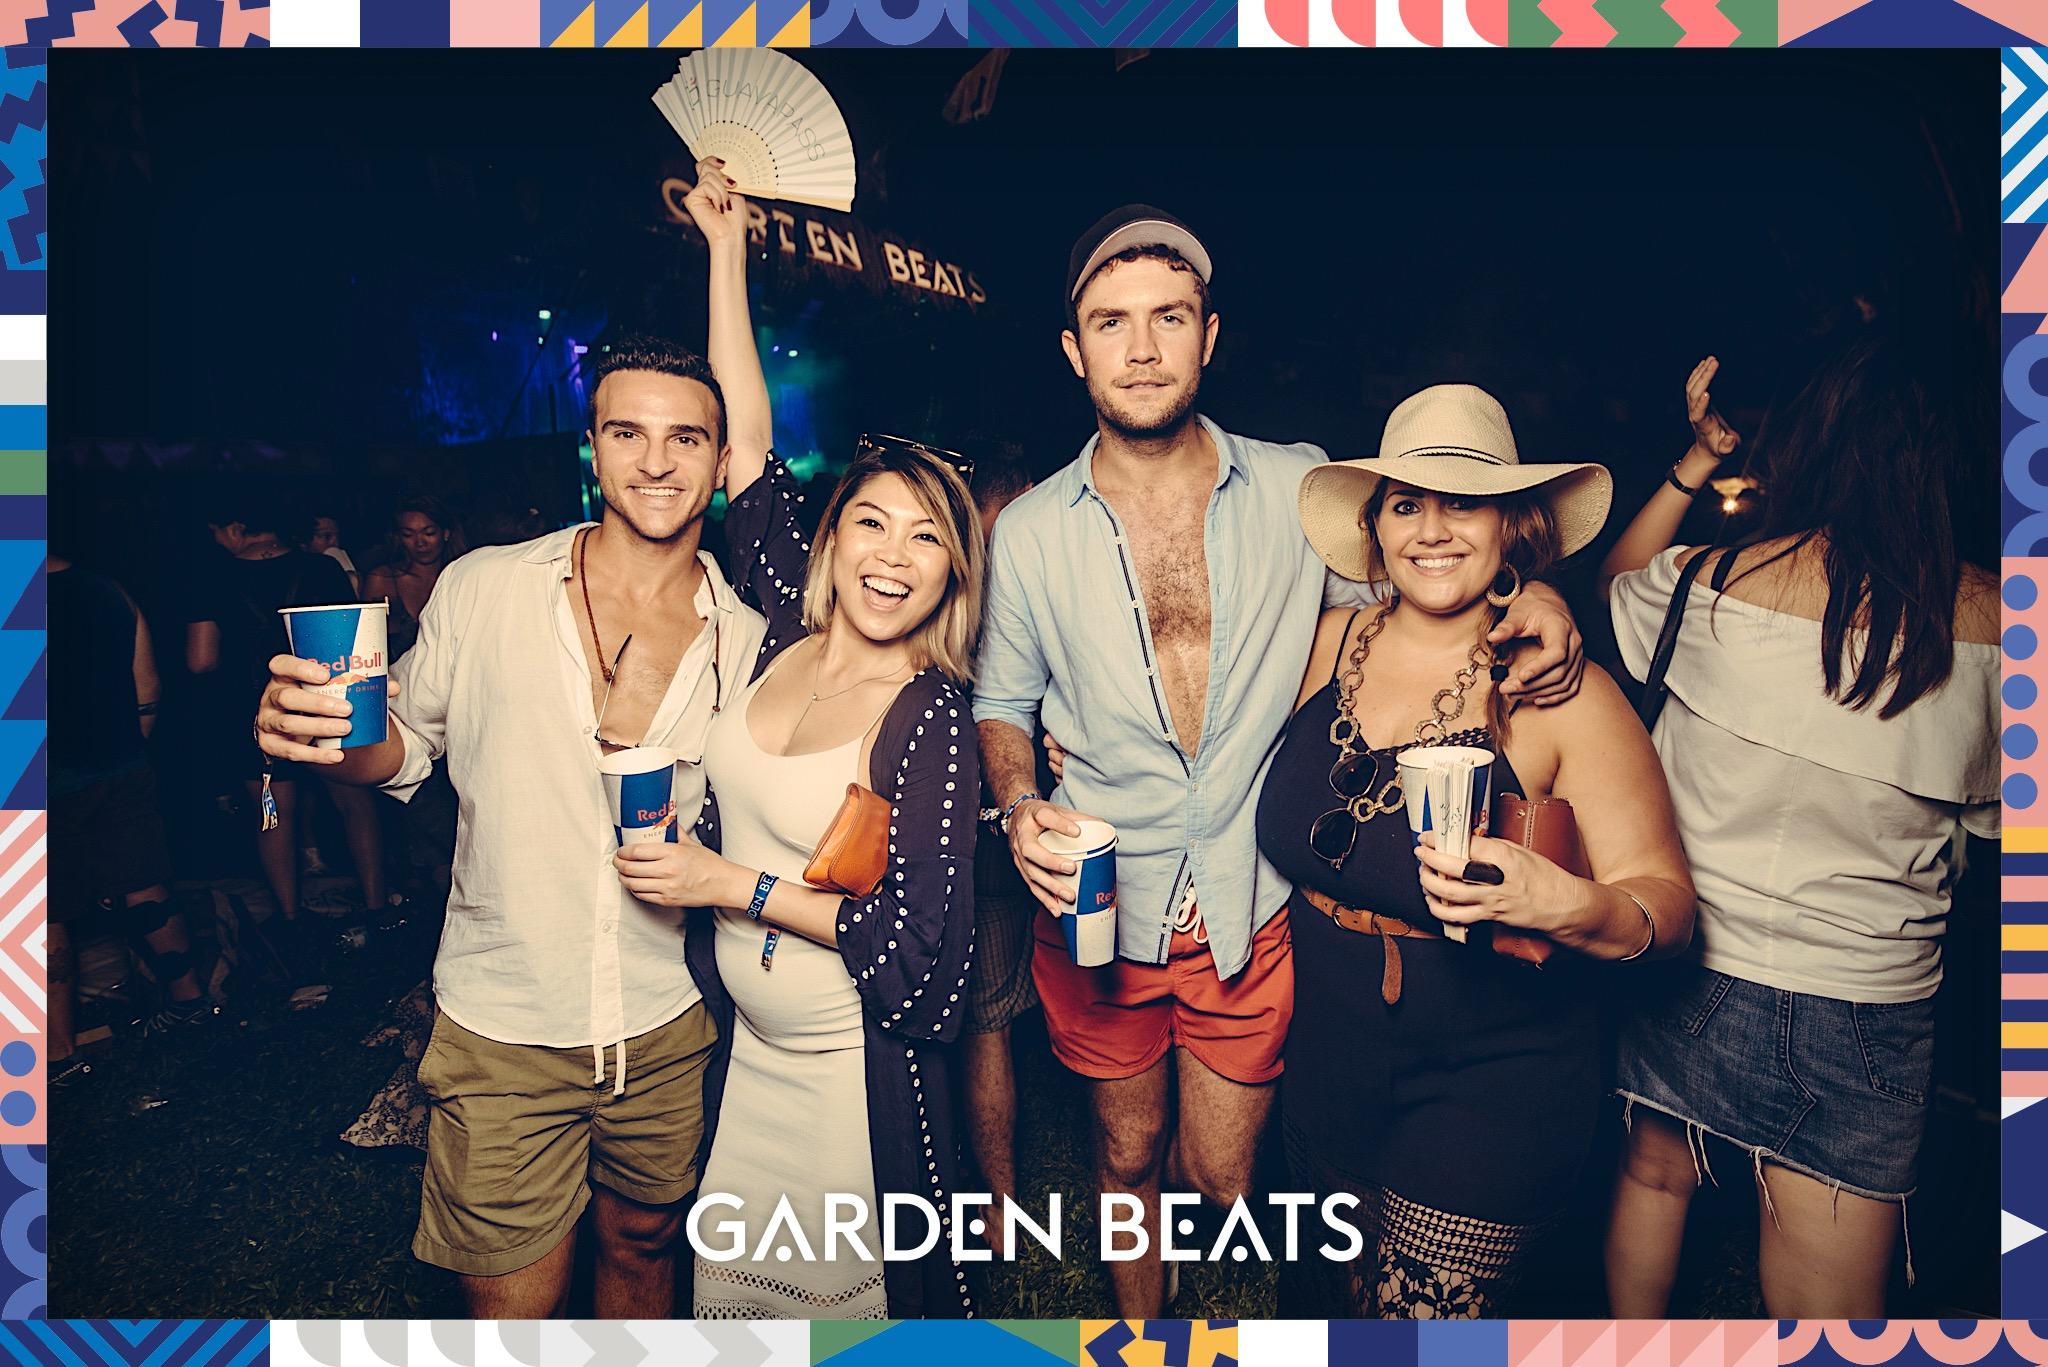 18032017_GardenBeats_Colossal764_WatermarkedGB.jpg